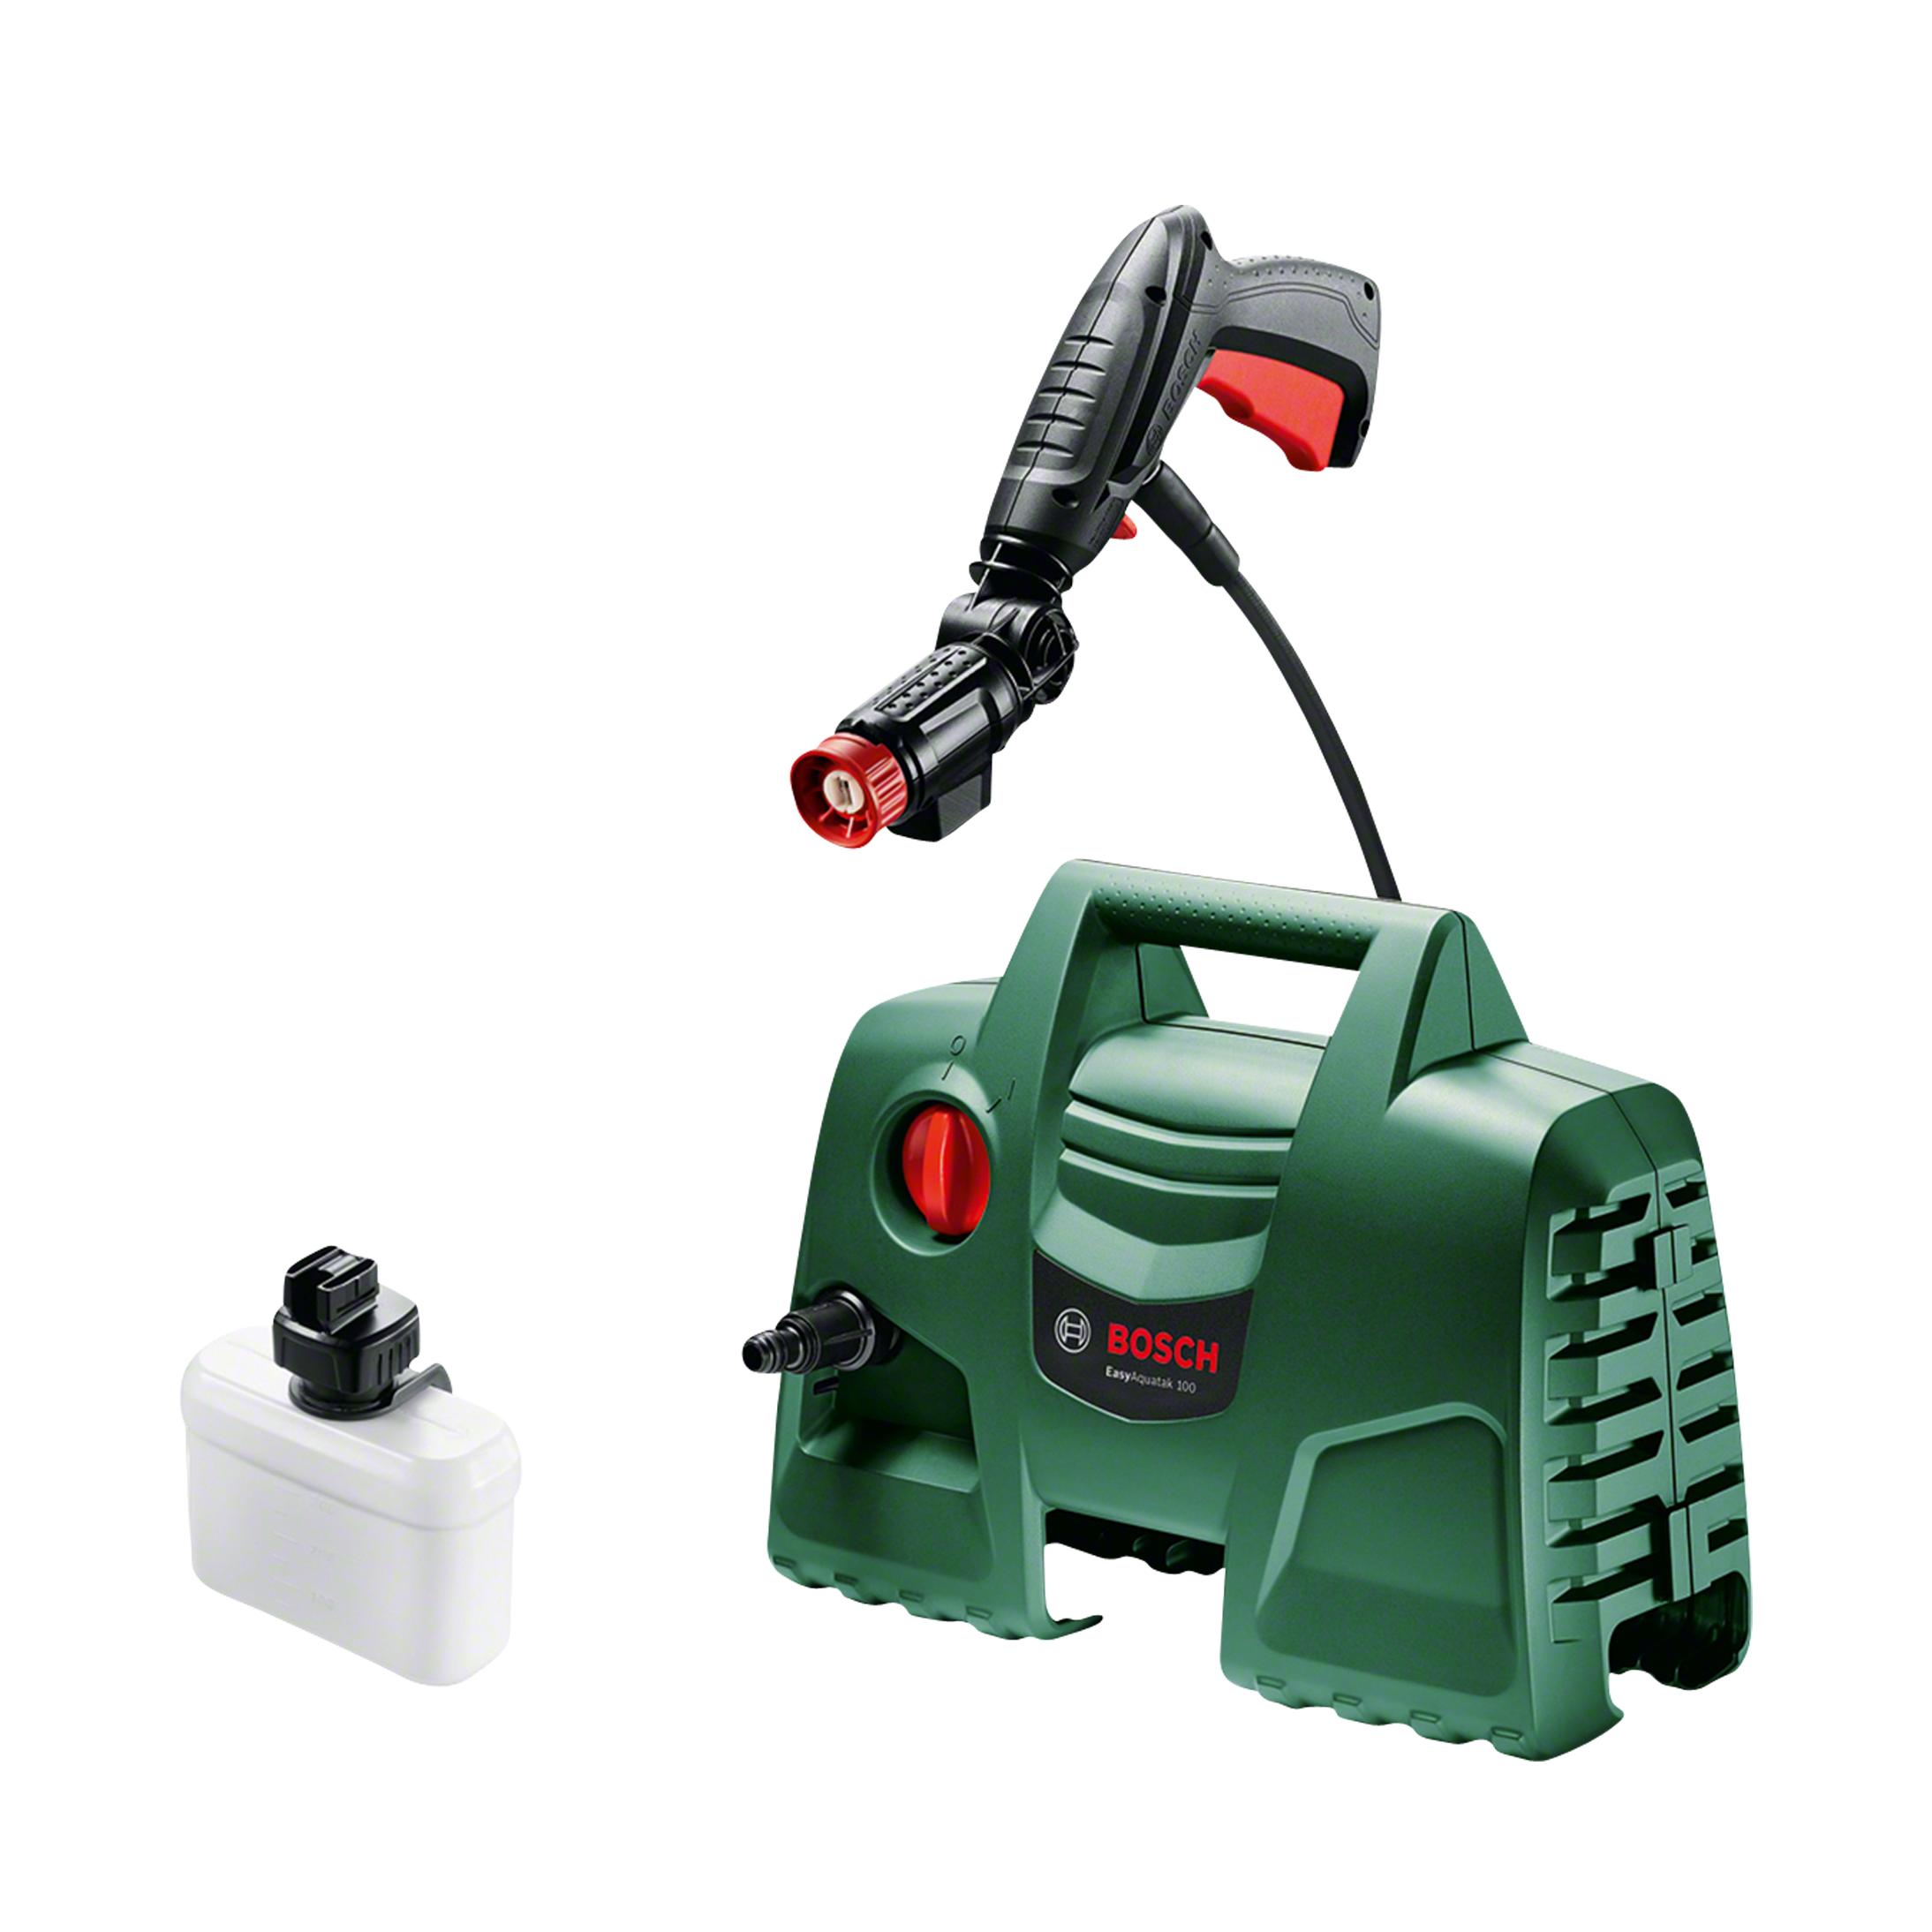 Bosch Nettoyeur Haute Pression Bosch EasyAquatak 100